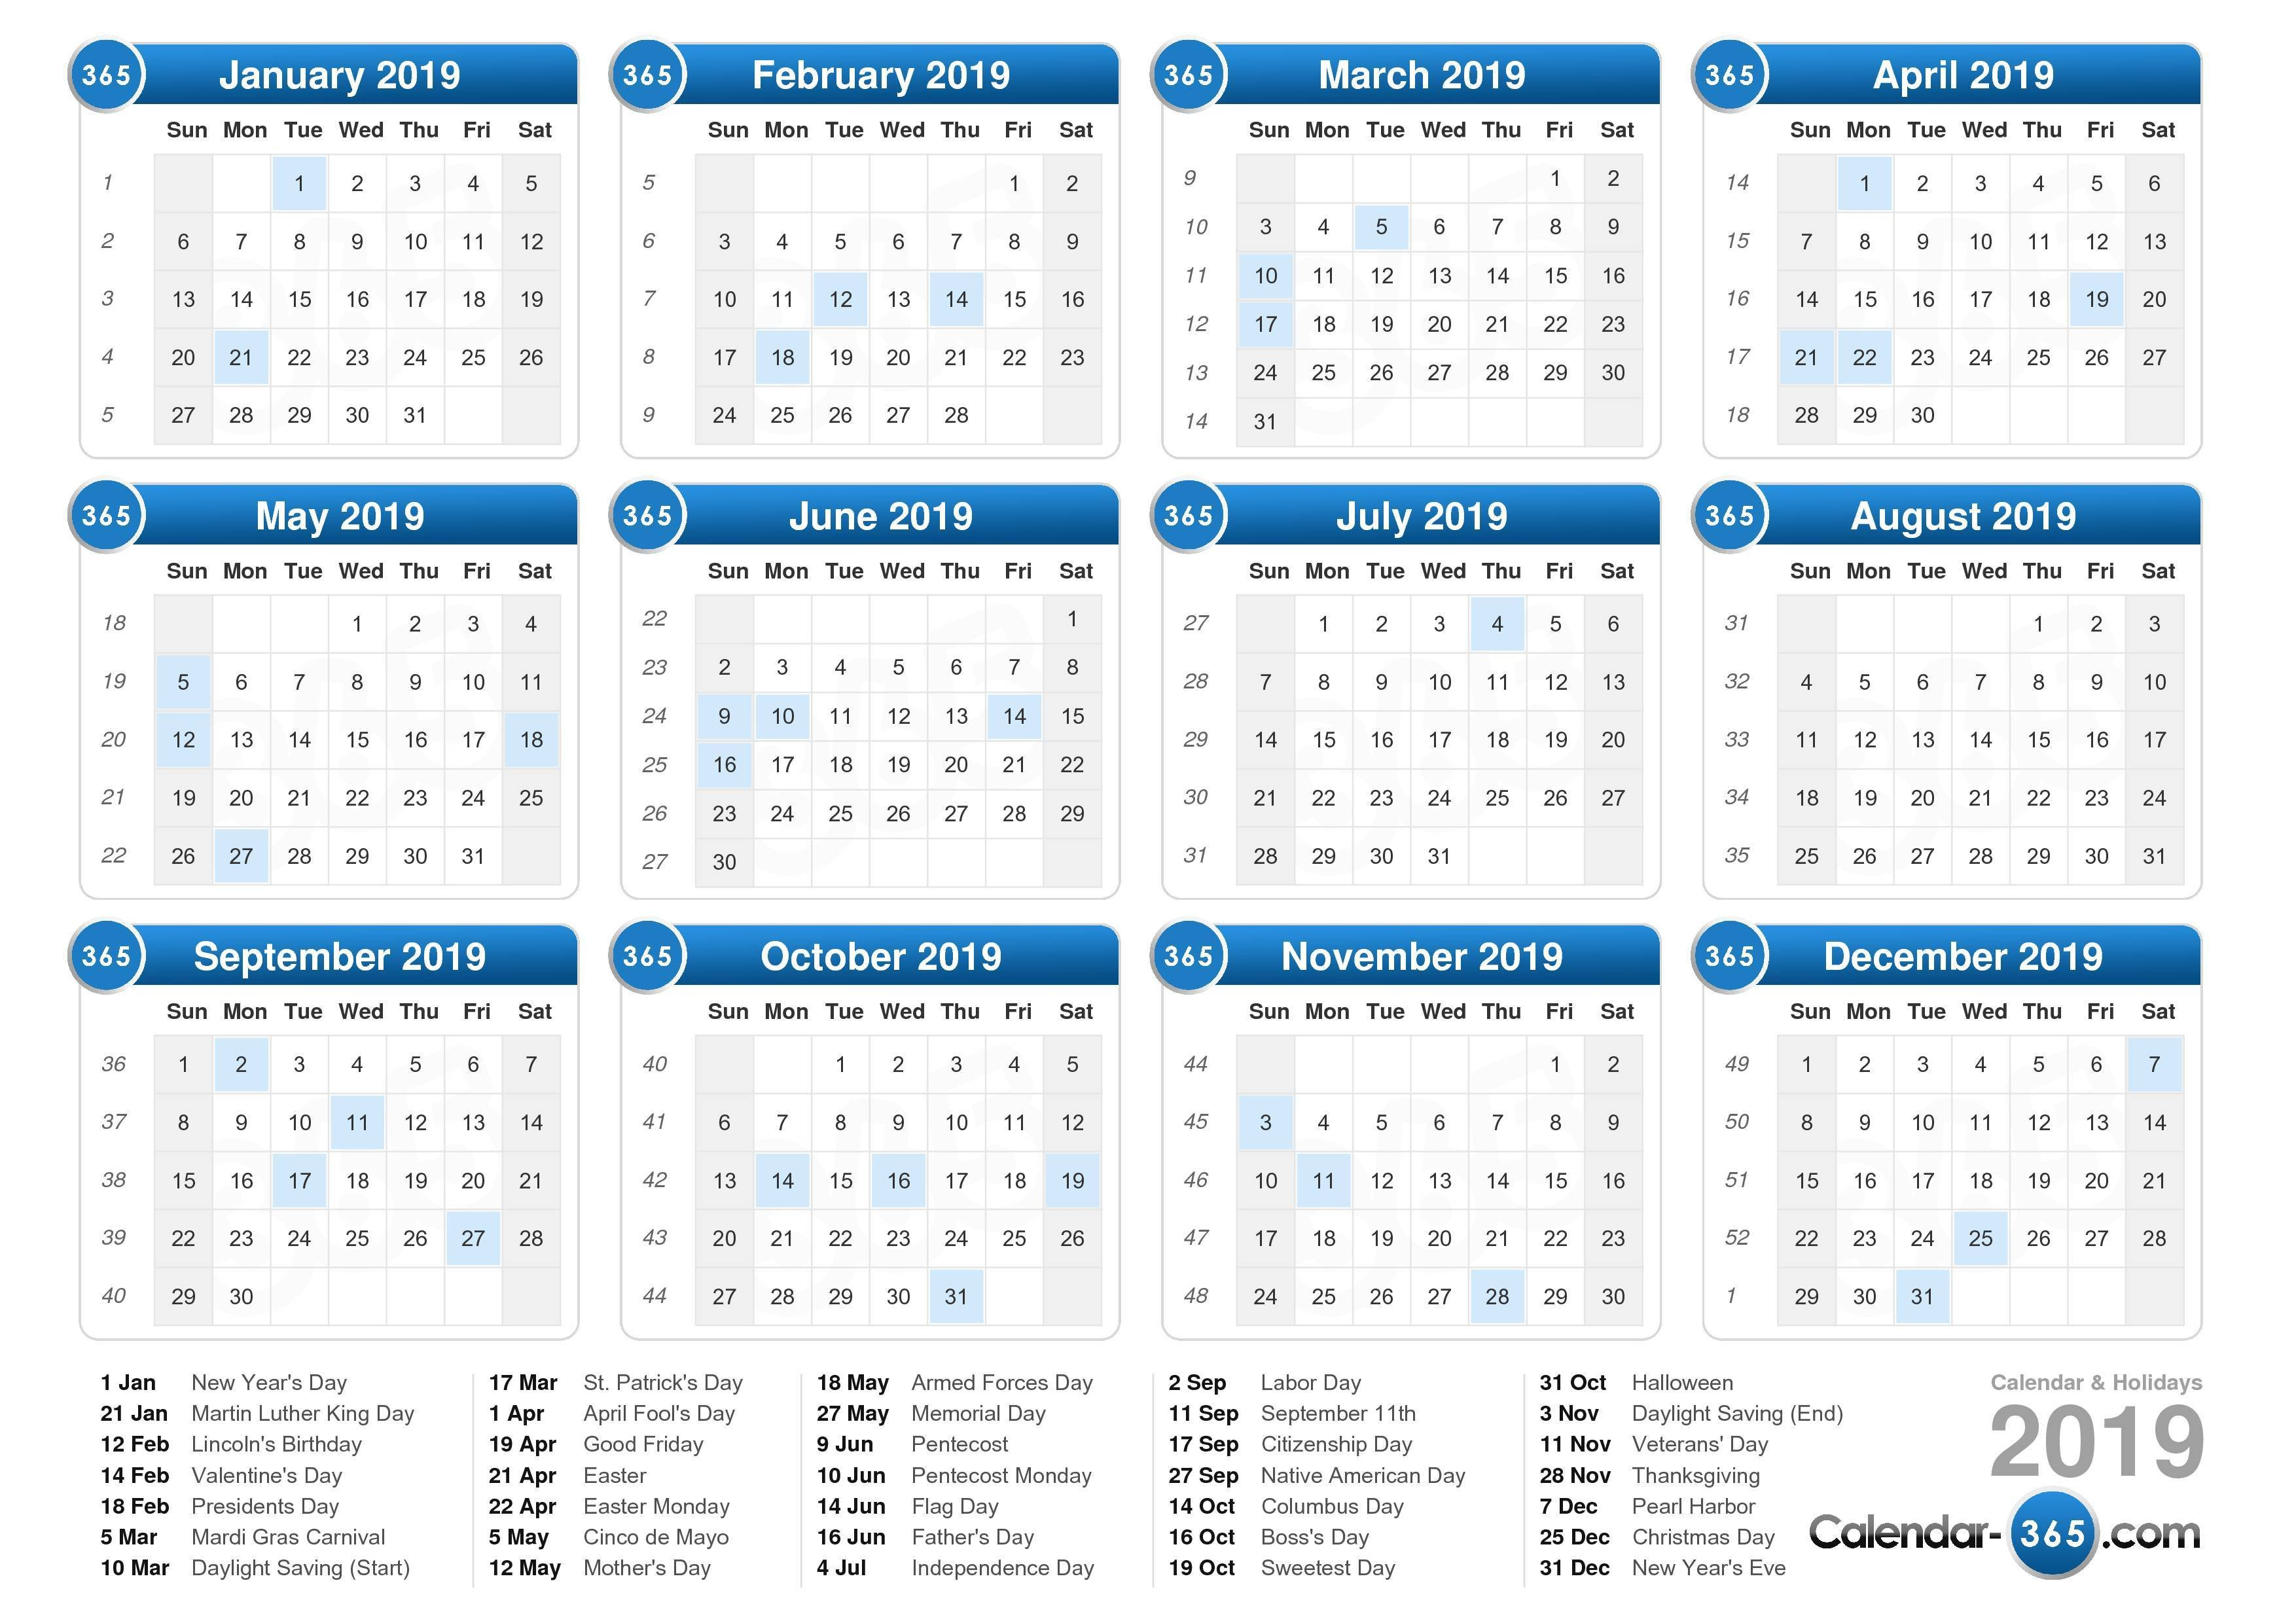 2019 Calendar 2019 Calendar 52 Weeks